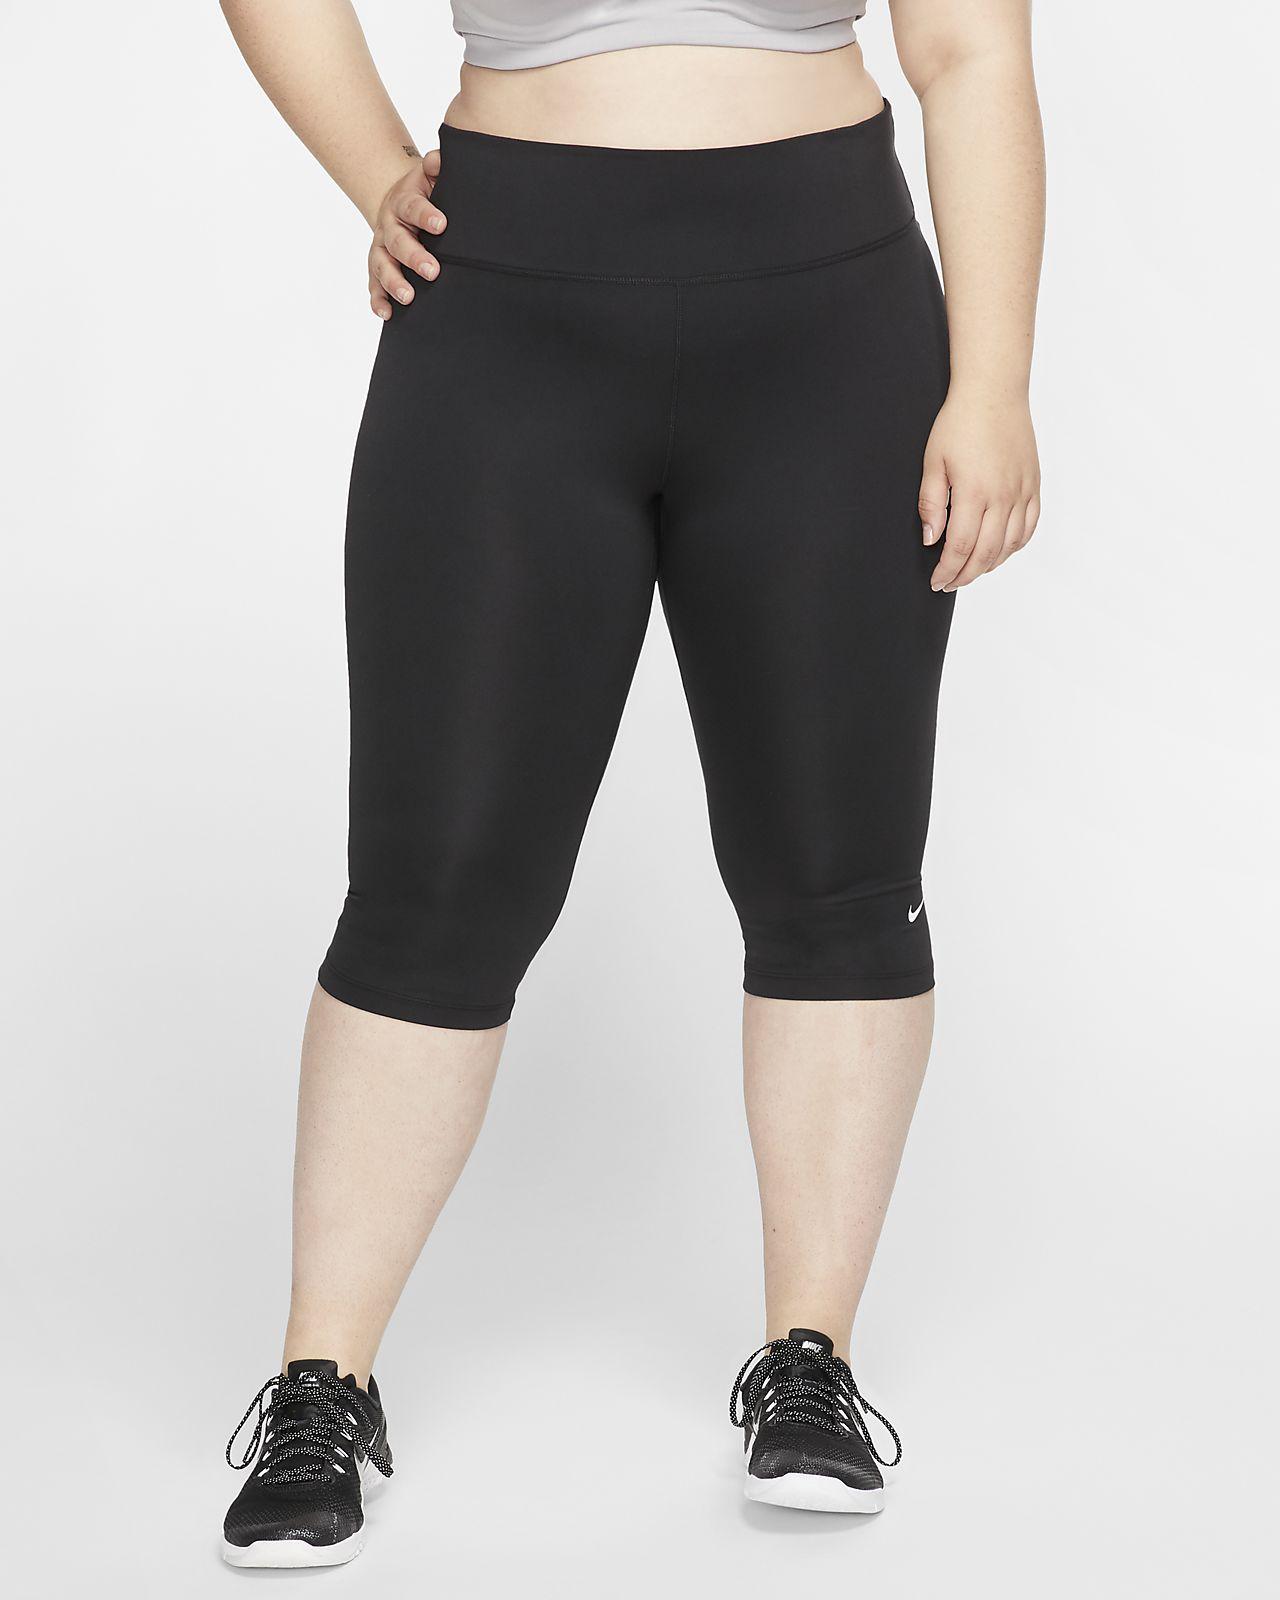 Nike One Pantalón pirata (Talla grande) - Mujer